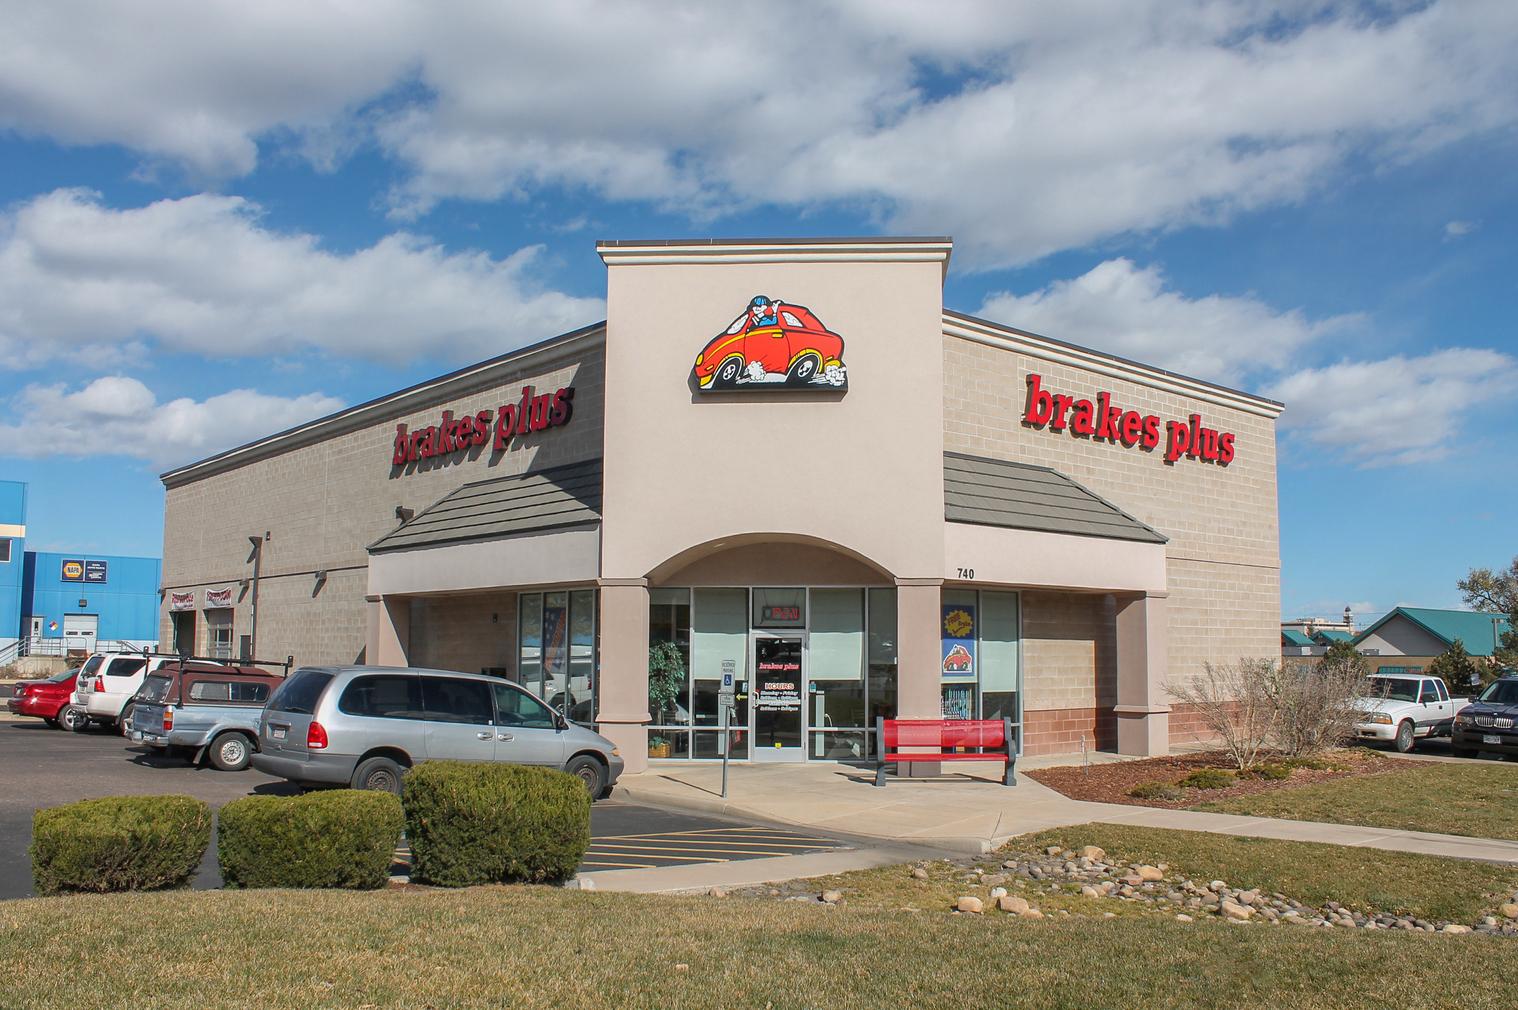 Brakes Plus at Colorado Springs, CO - Broadmoor